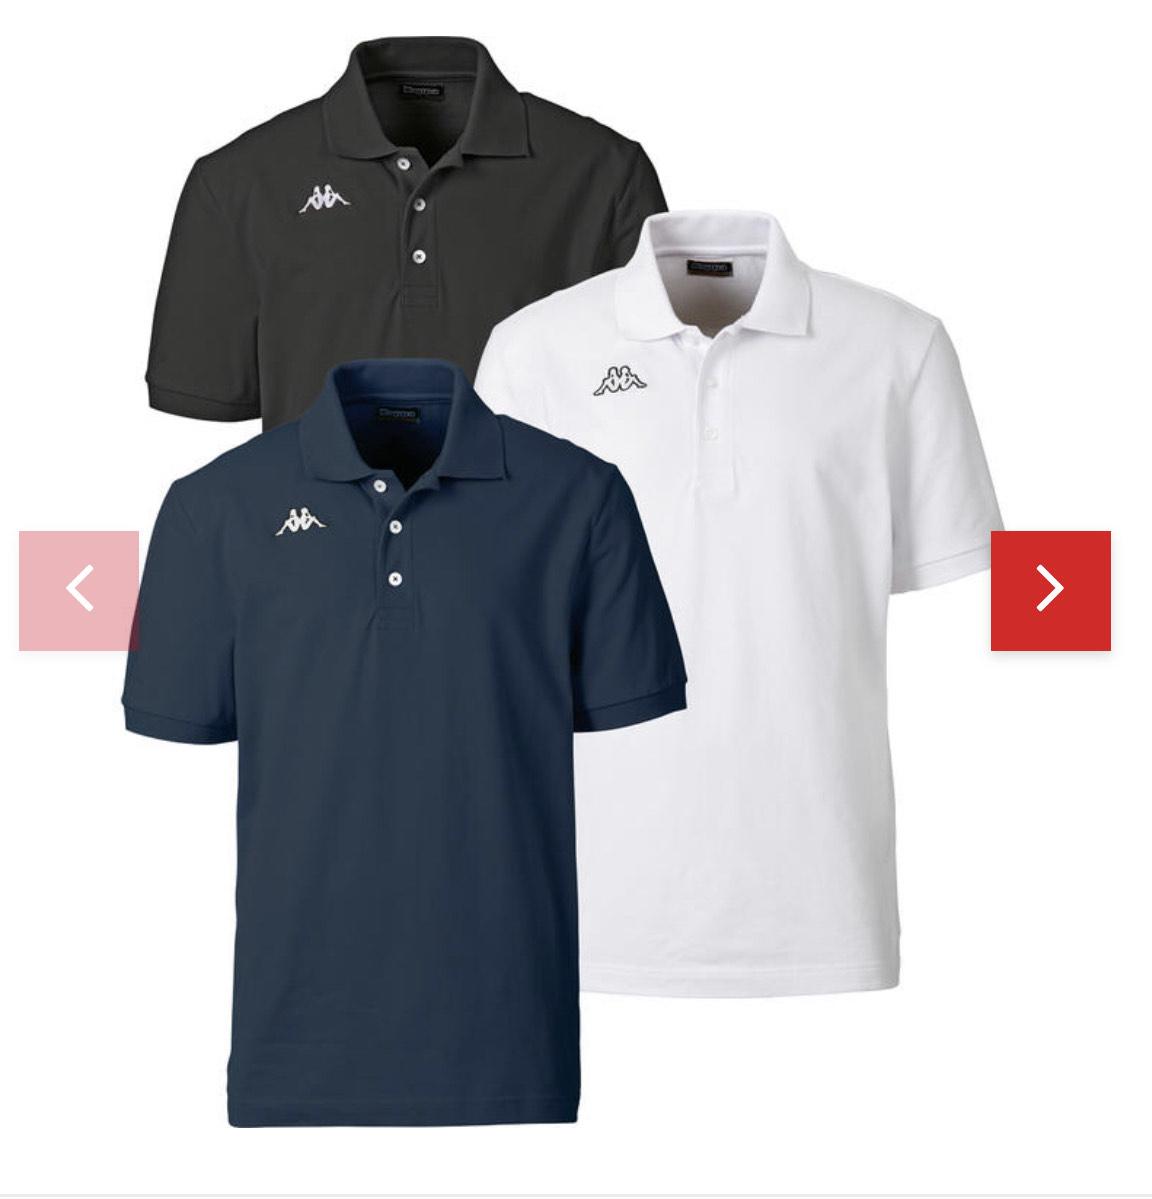 3er Pack Poloshirts von Kappa